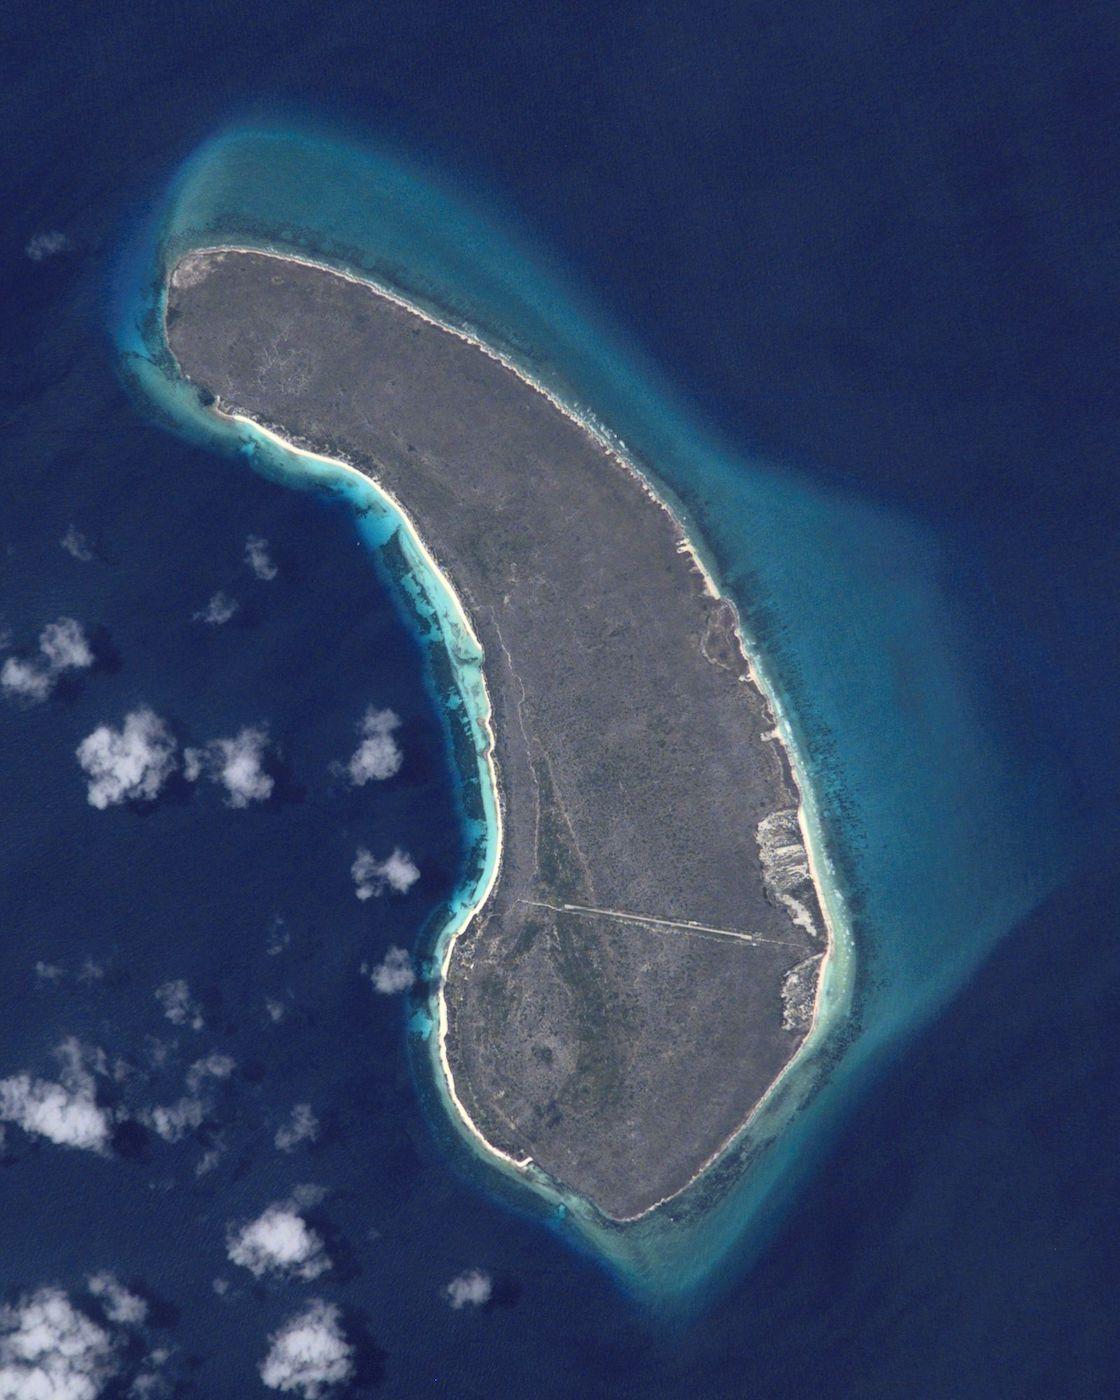 Assumtion island, Seychelles. credit: Wikimedia Commons